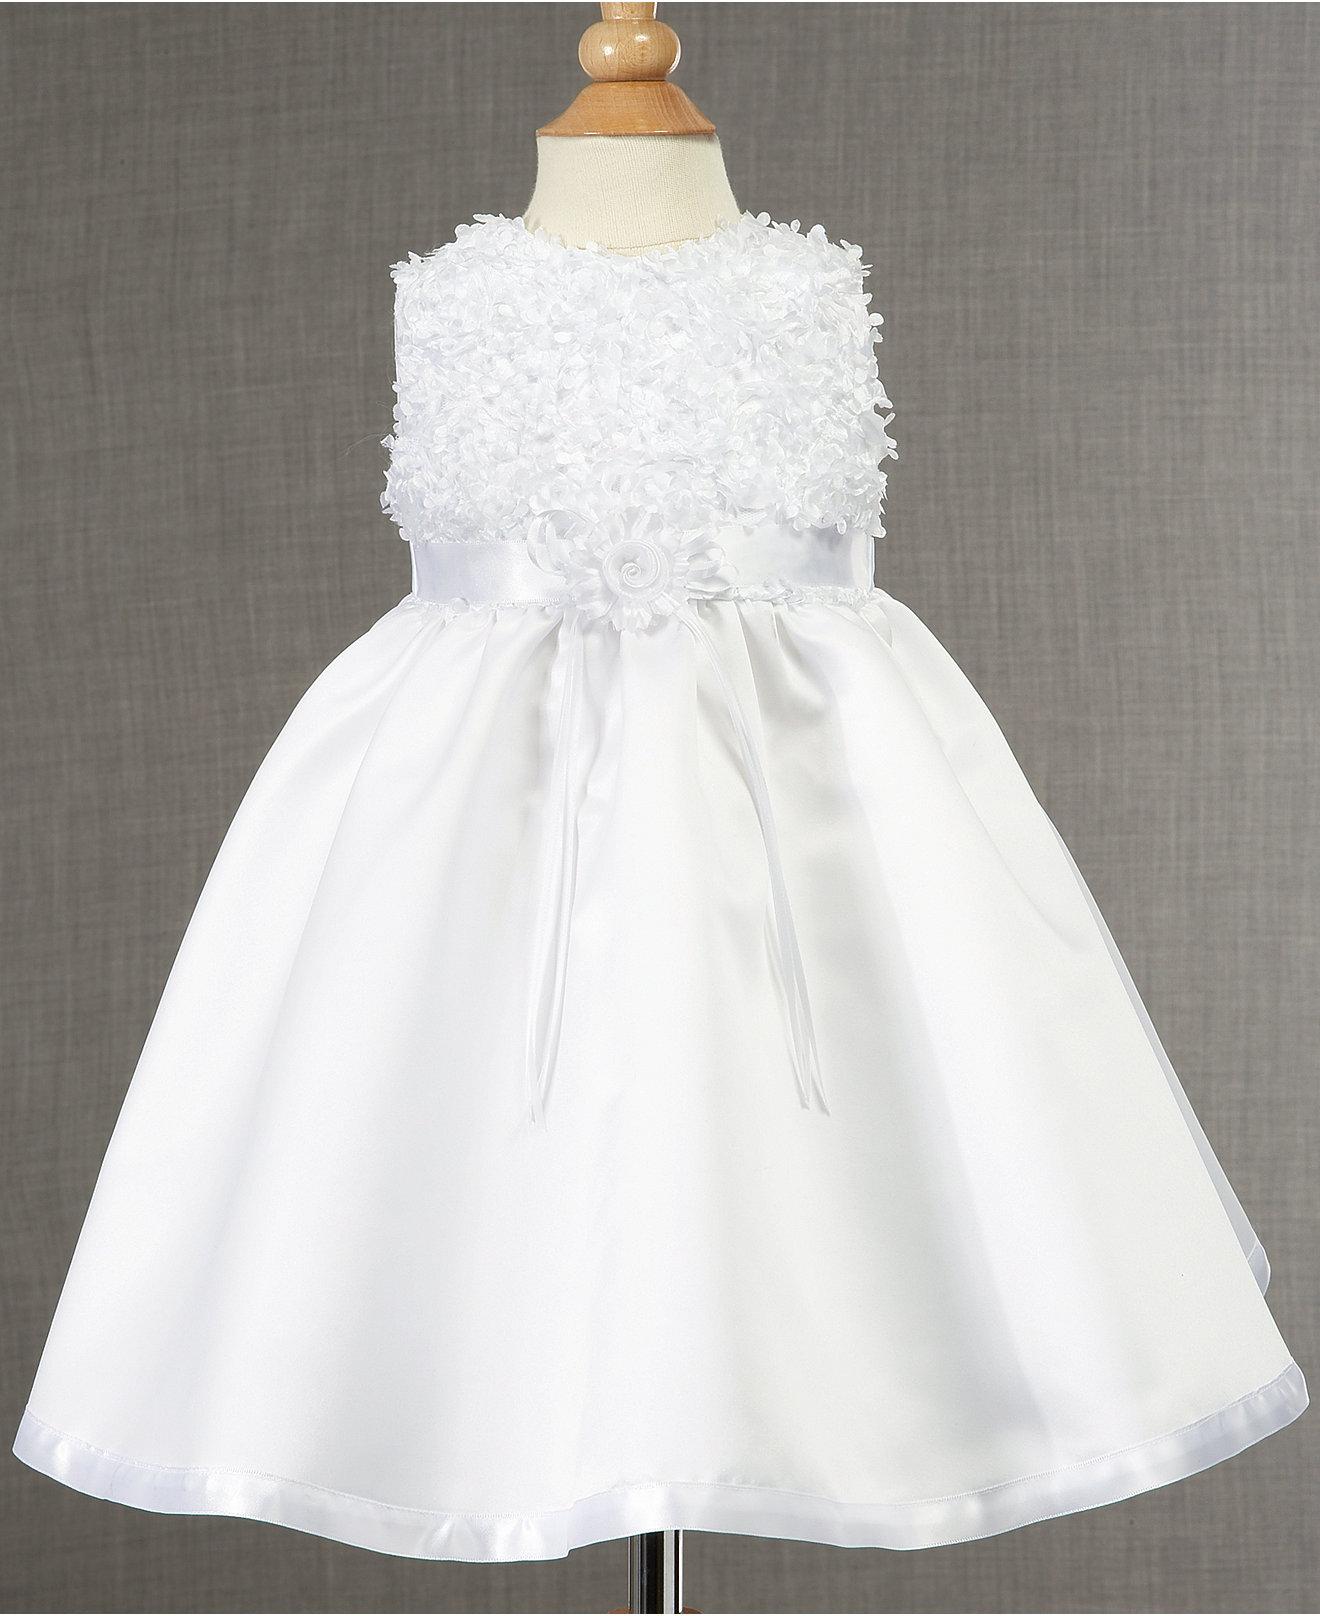 Baby Girls Christening Dresses